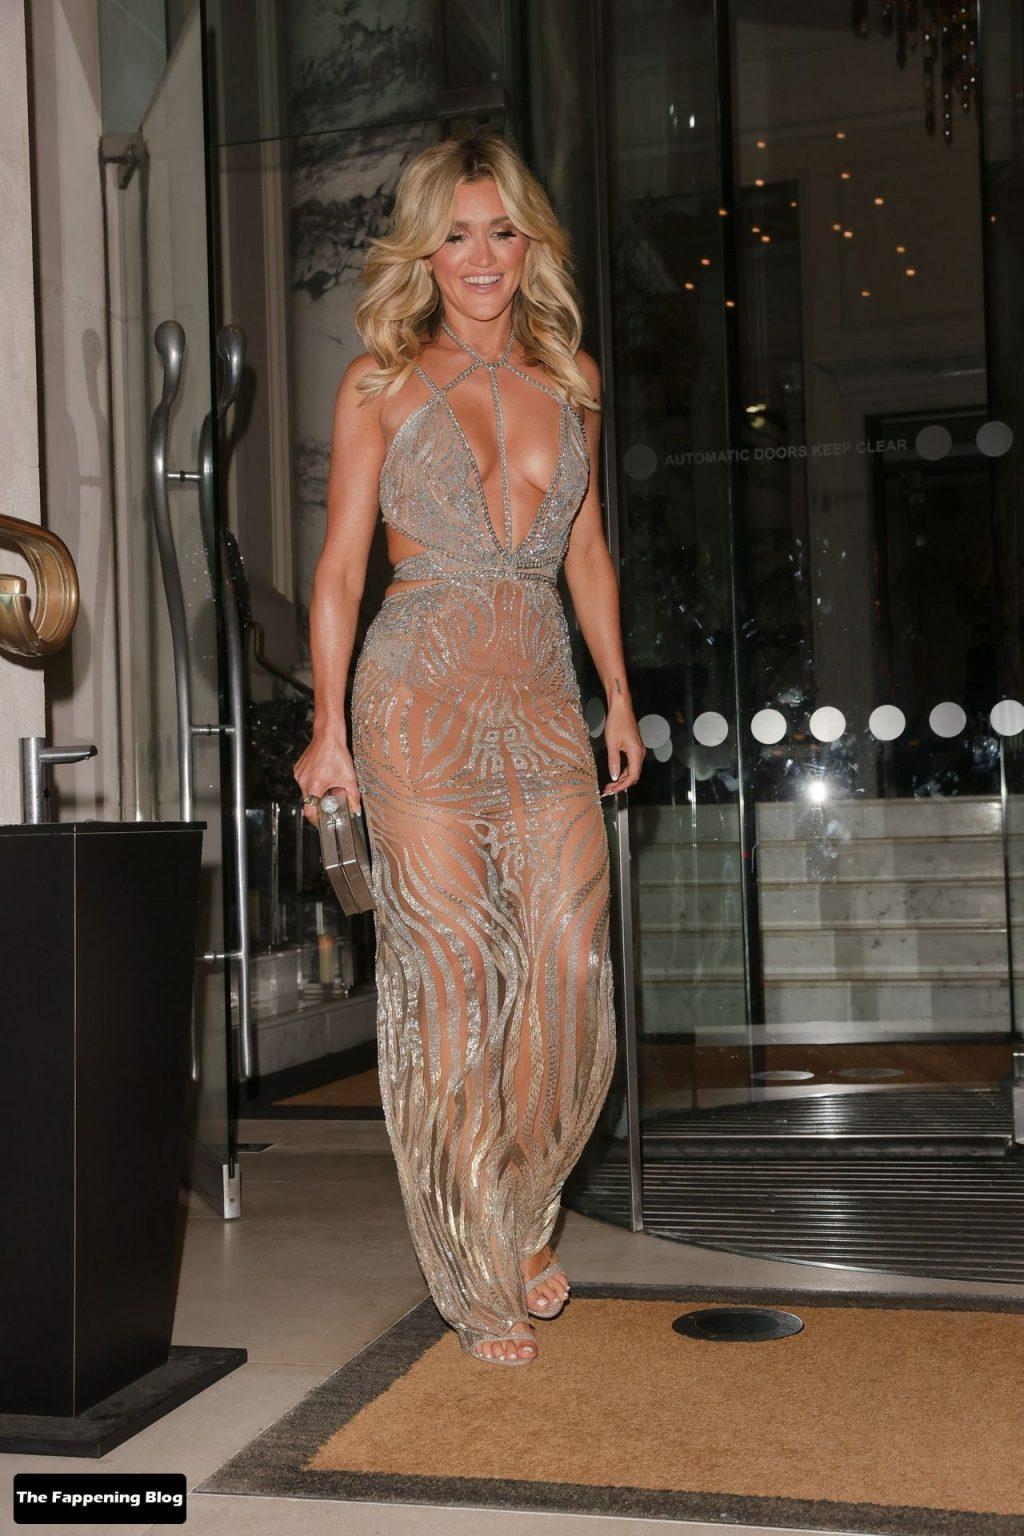 Ashley Roberts Looks Sensational Wearing a Beautiful Julien Macdonald Dress (53 Photos + Video)